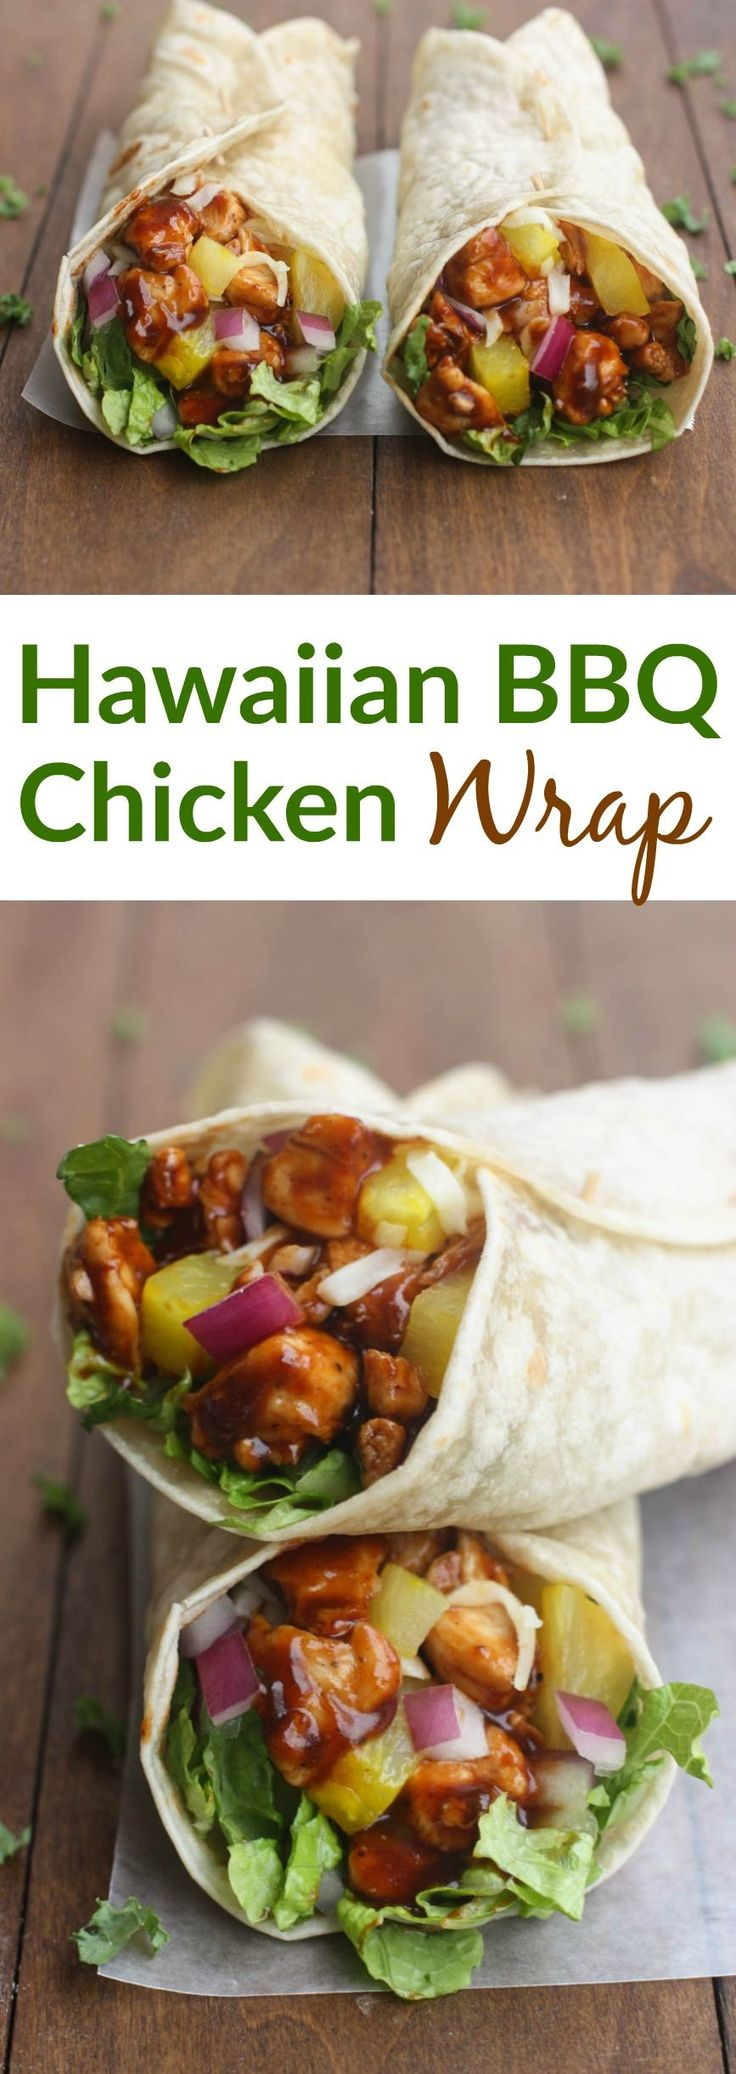 Hawaiian BBQ Chicken Wraps.